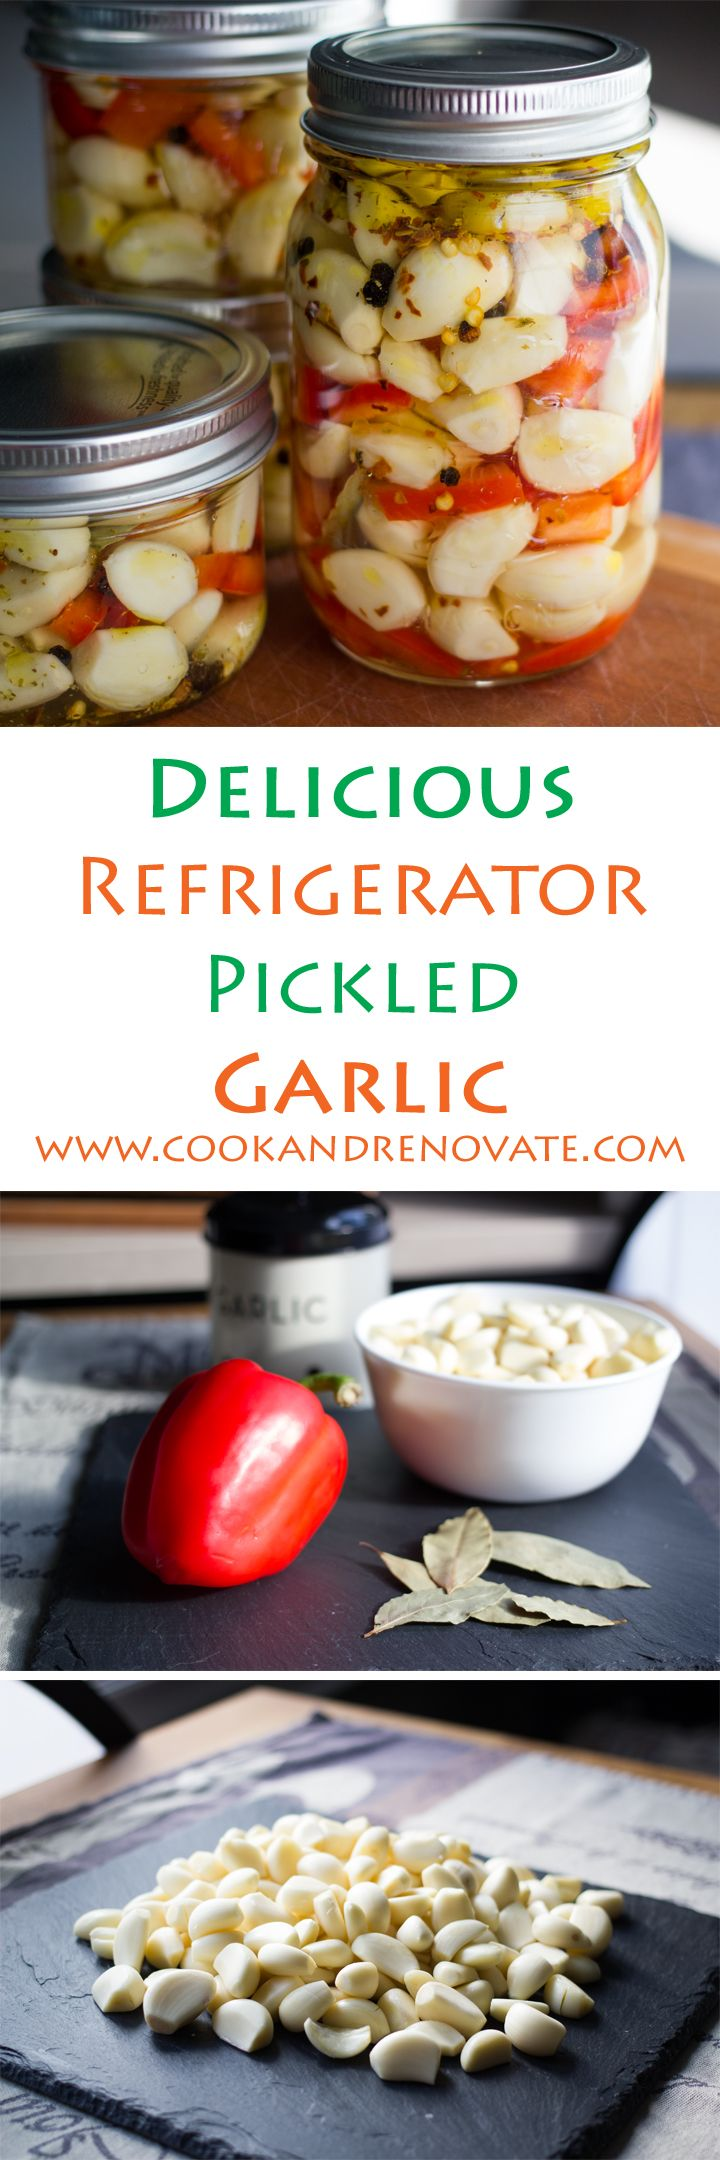 Pickled Garlic At Your Fingertips!